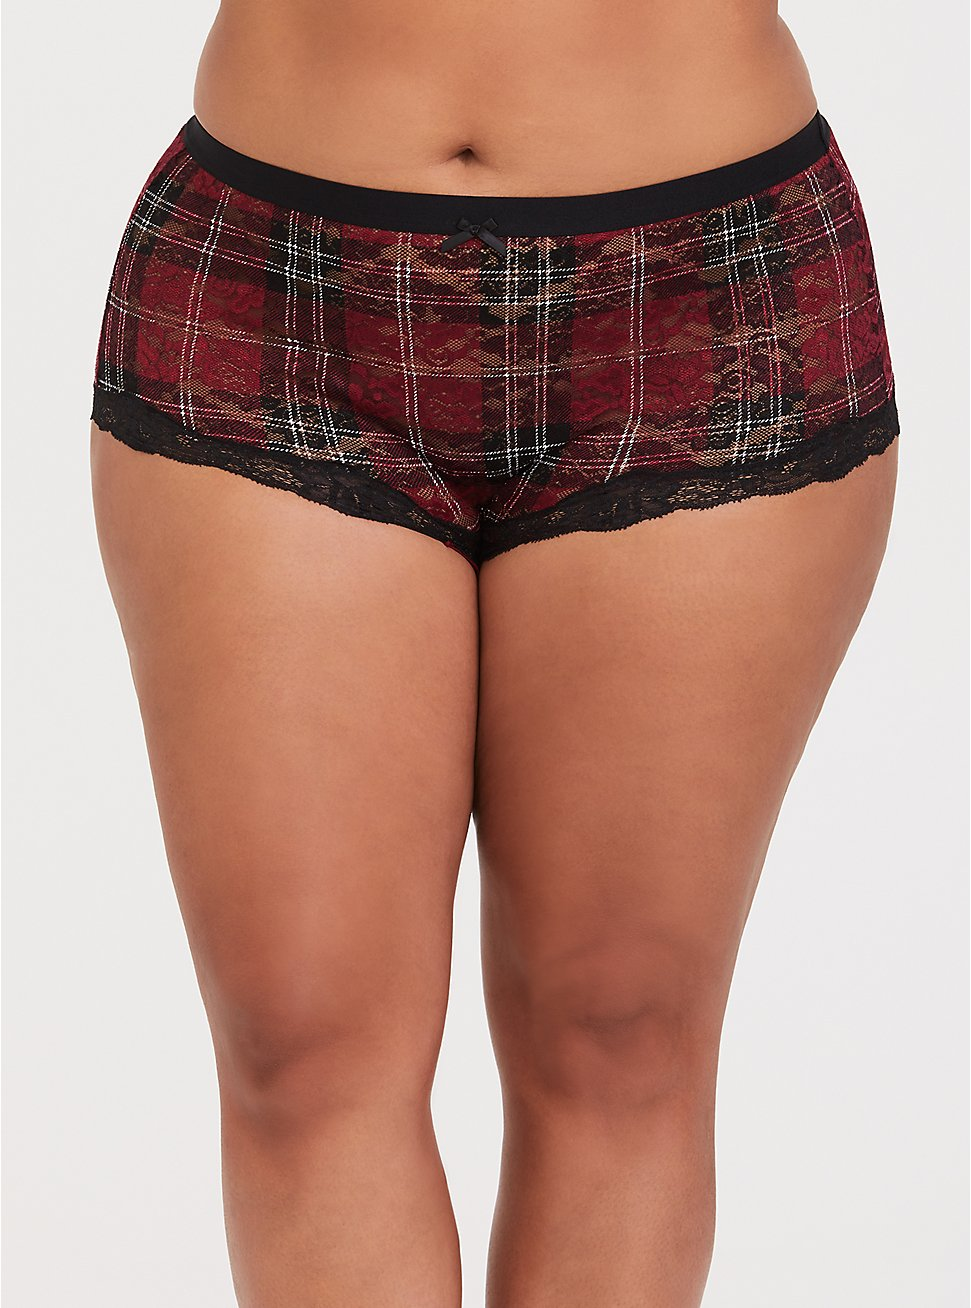 Dark Red Plaid Lace Brief Panty, PLAID-RED, hi-res